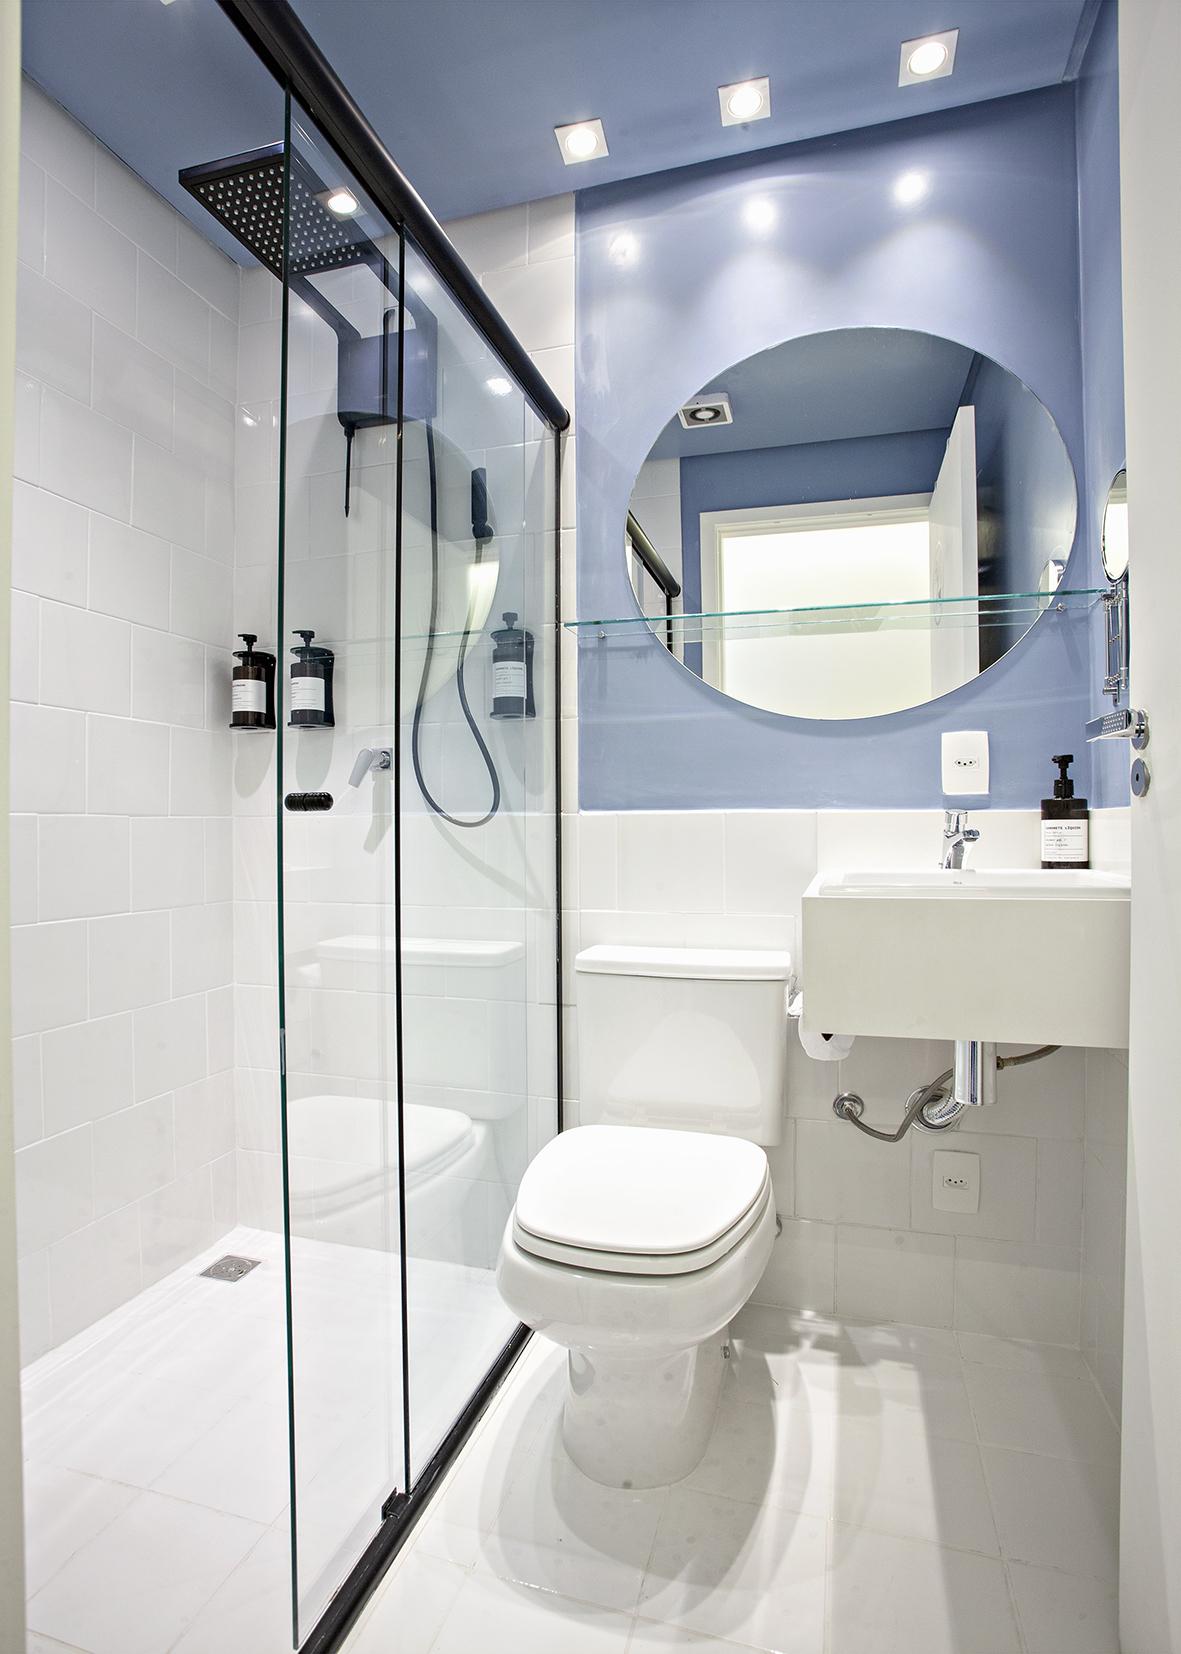 OnPod banheiro